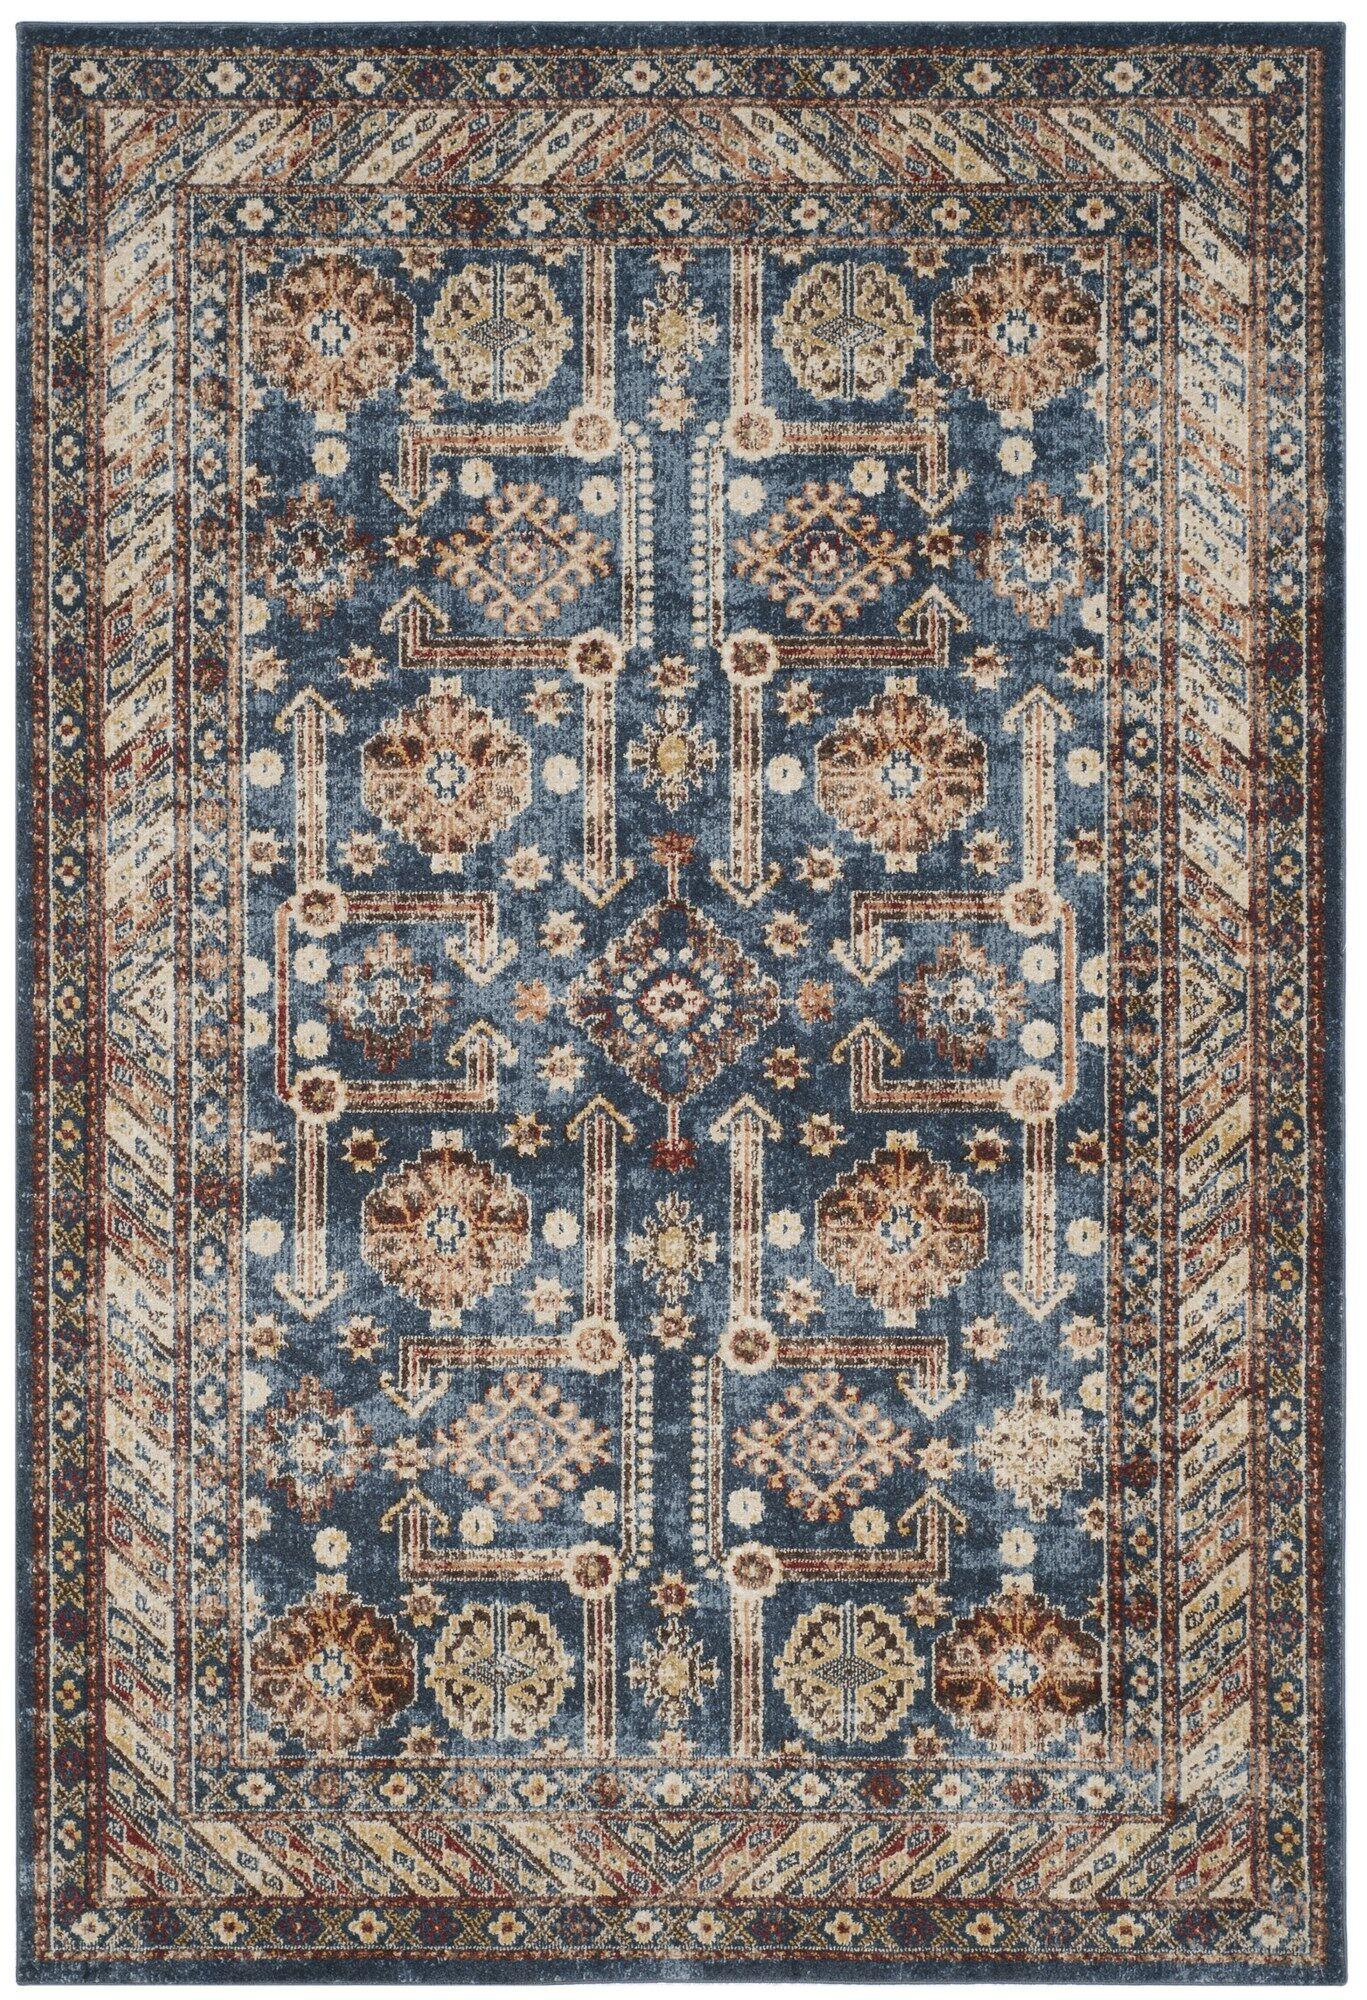 Isanotski Brown/Blue Area Rug Rug Size: Rectangle 10' x 14'